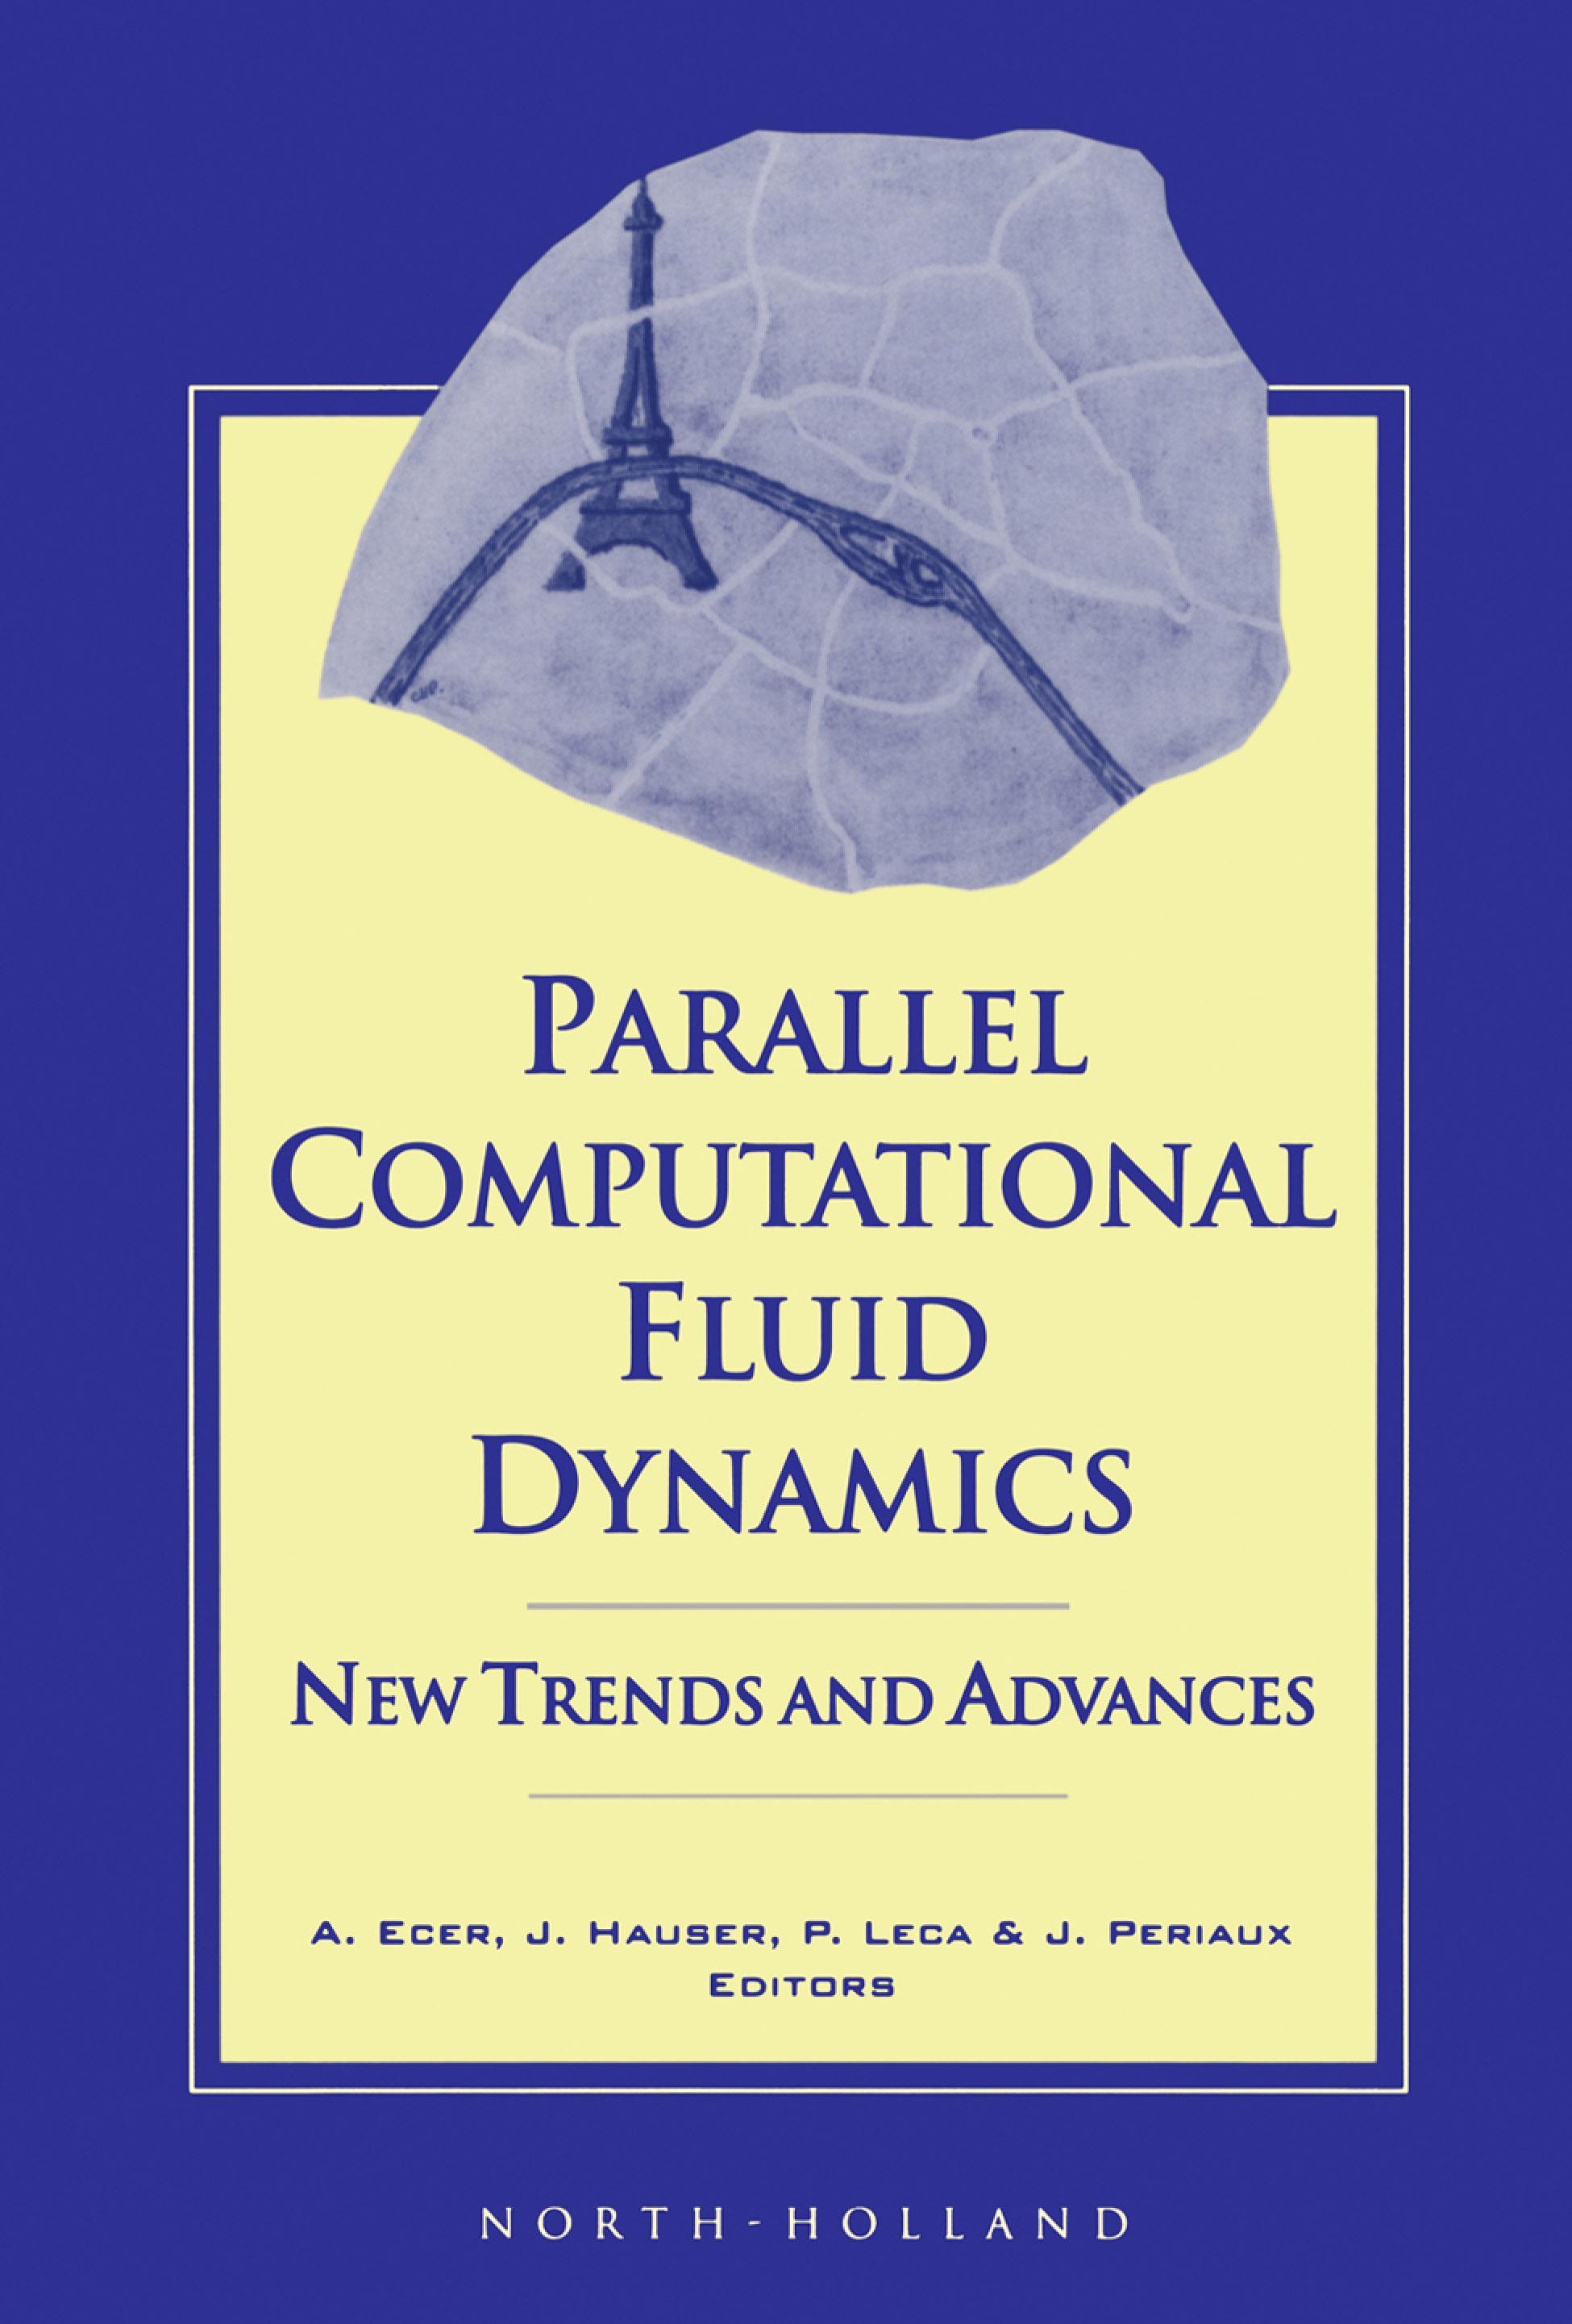 Parallel Computational Fluid Dynamics '93: New Trends and Advances EB9780080538457